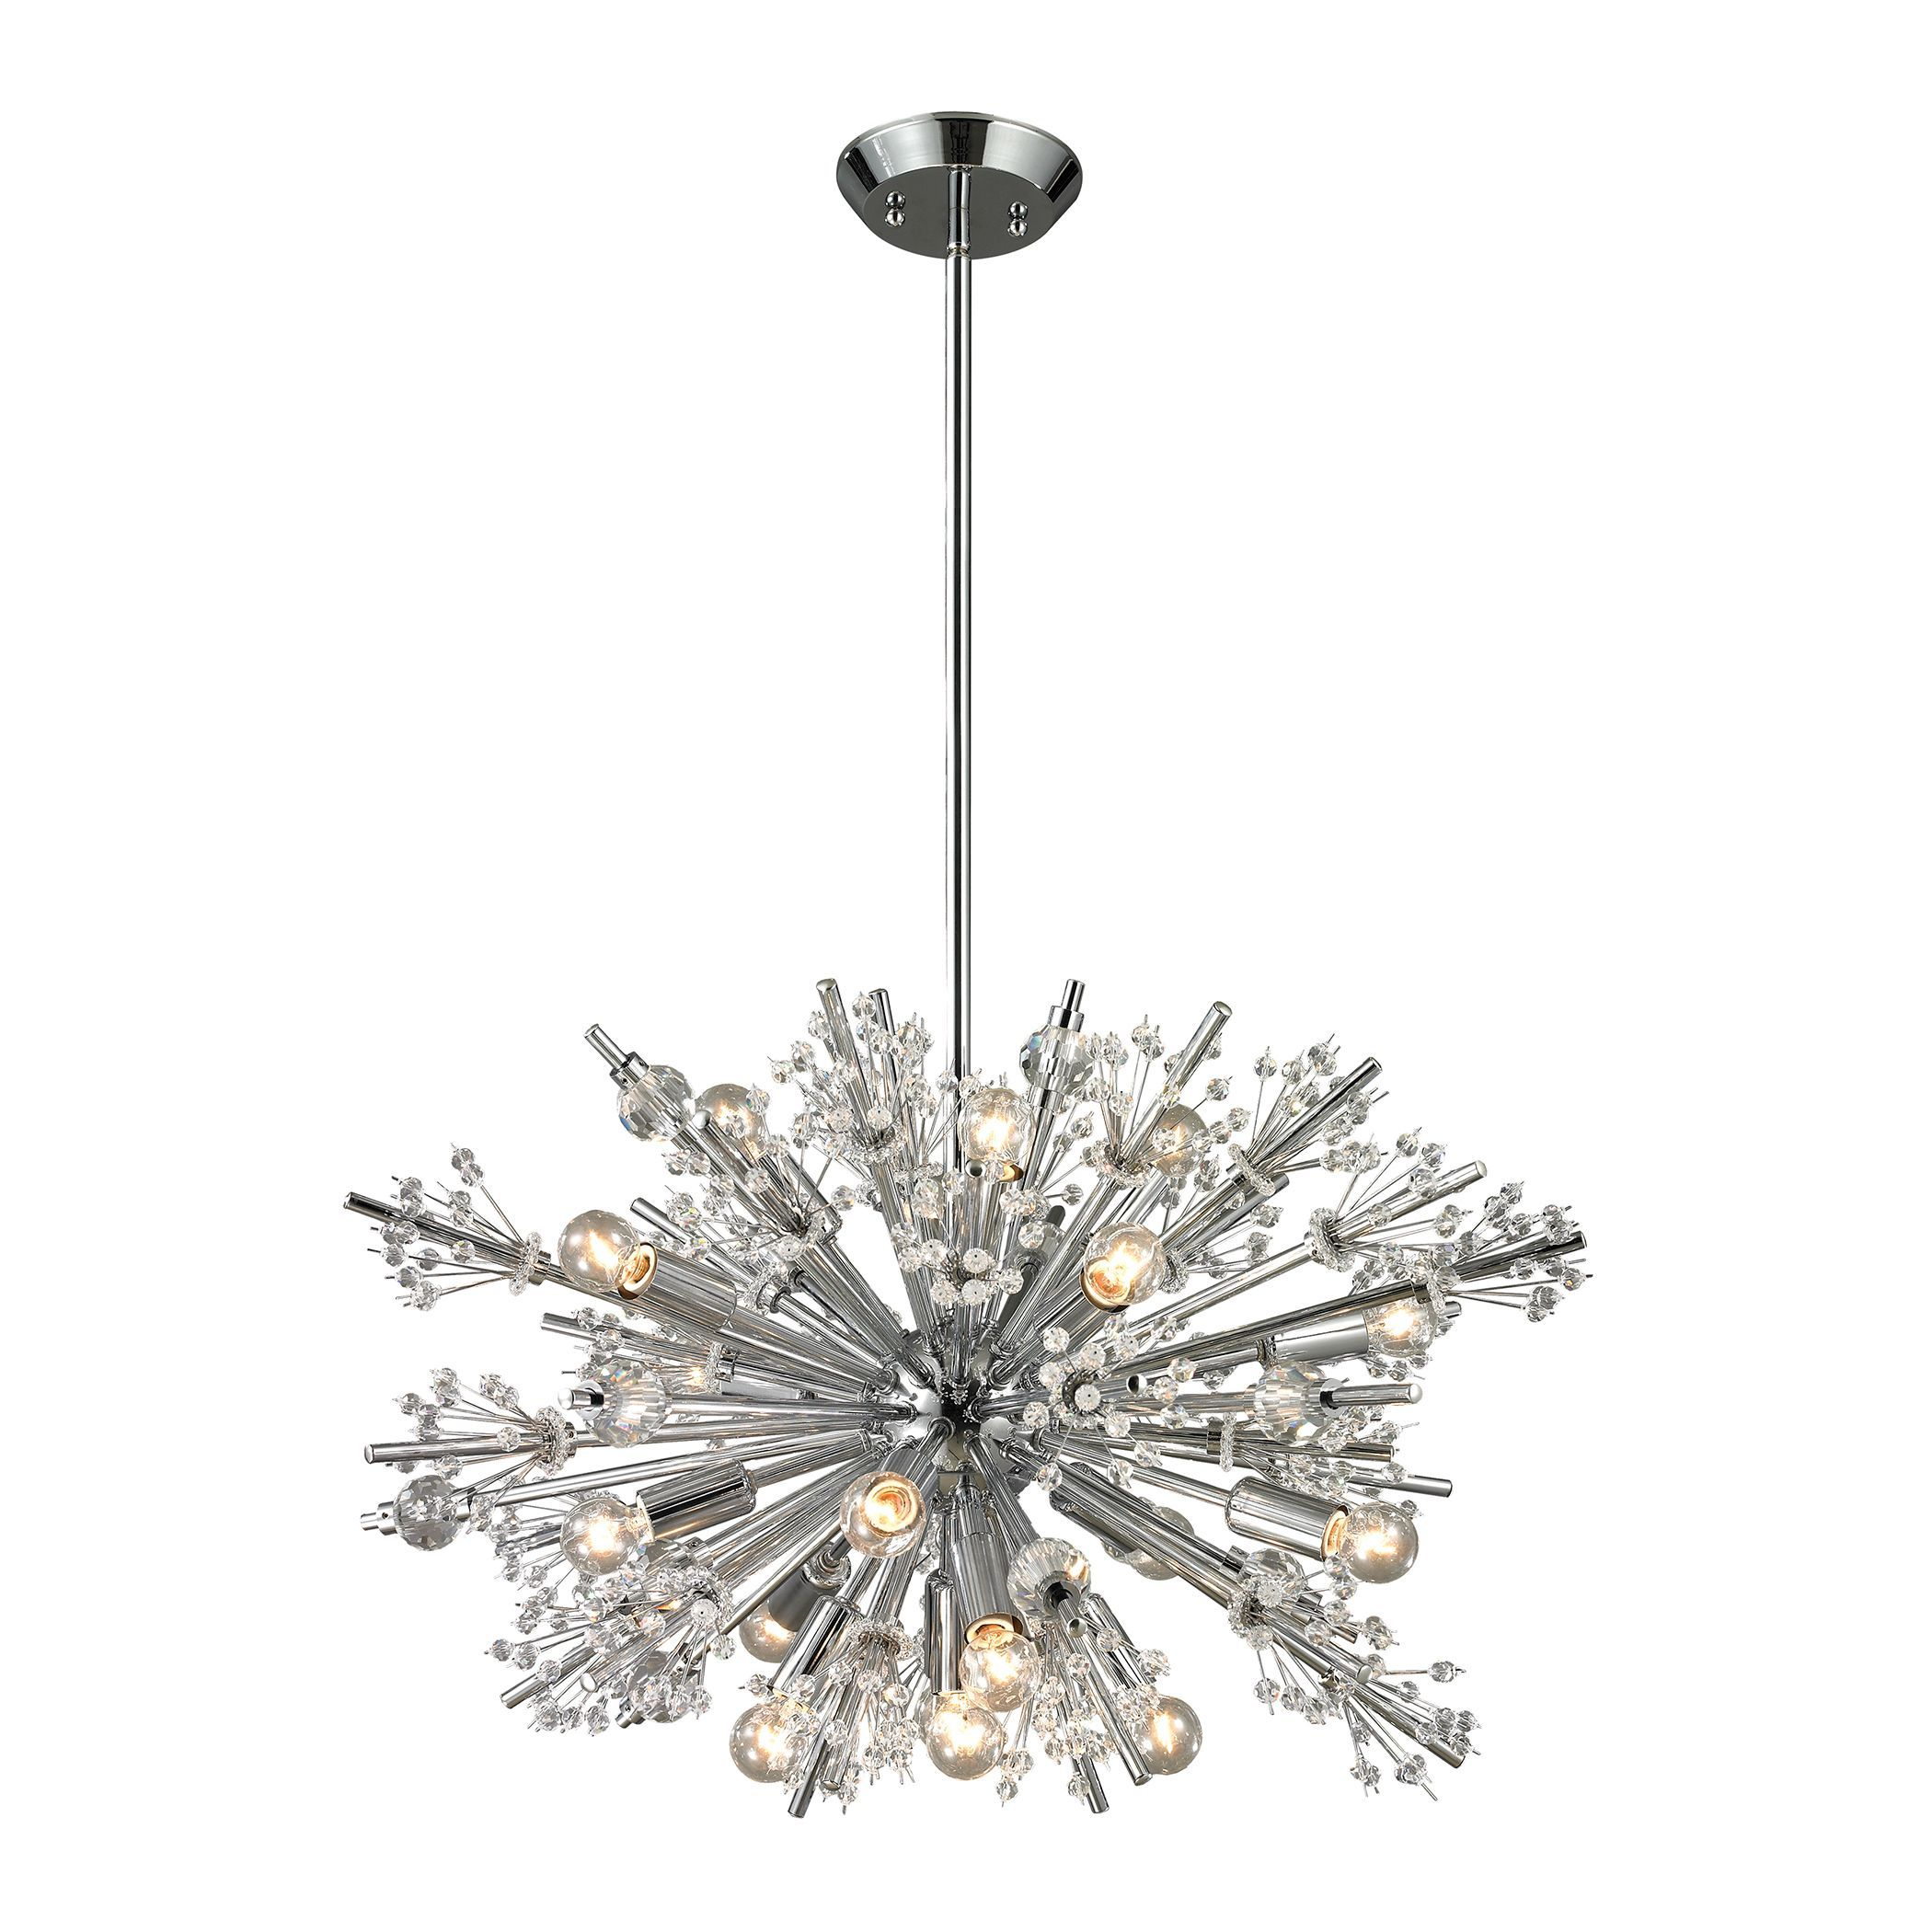 gallery teardrop pendant pendants lilybuds fine art lily lamps index urchin lighting foyer by entry chandeliers installation buds chandelier